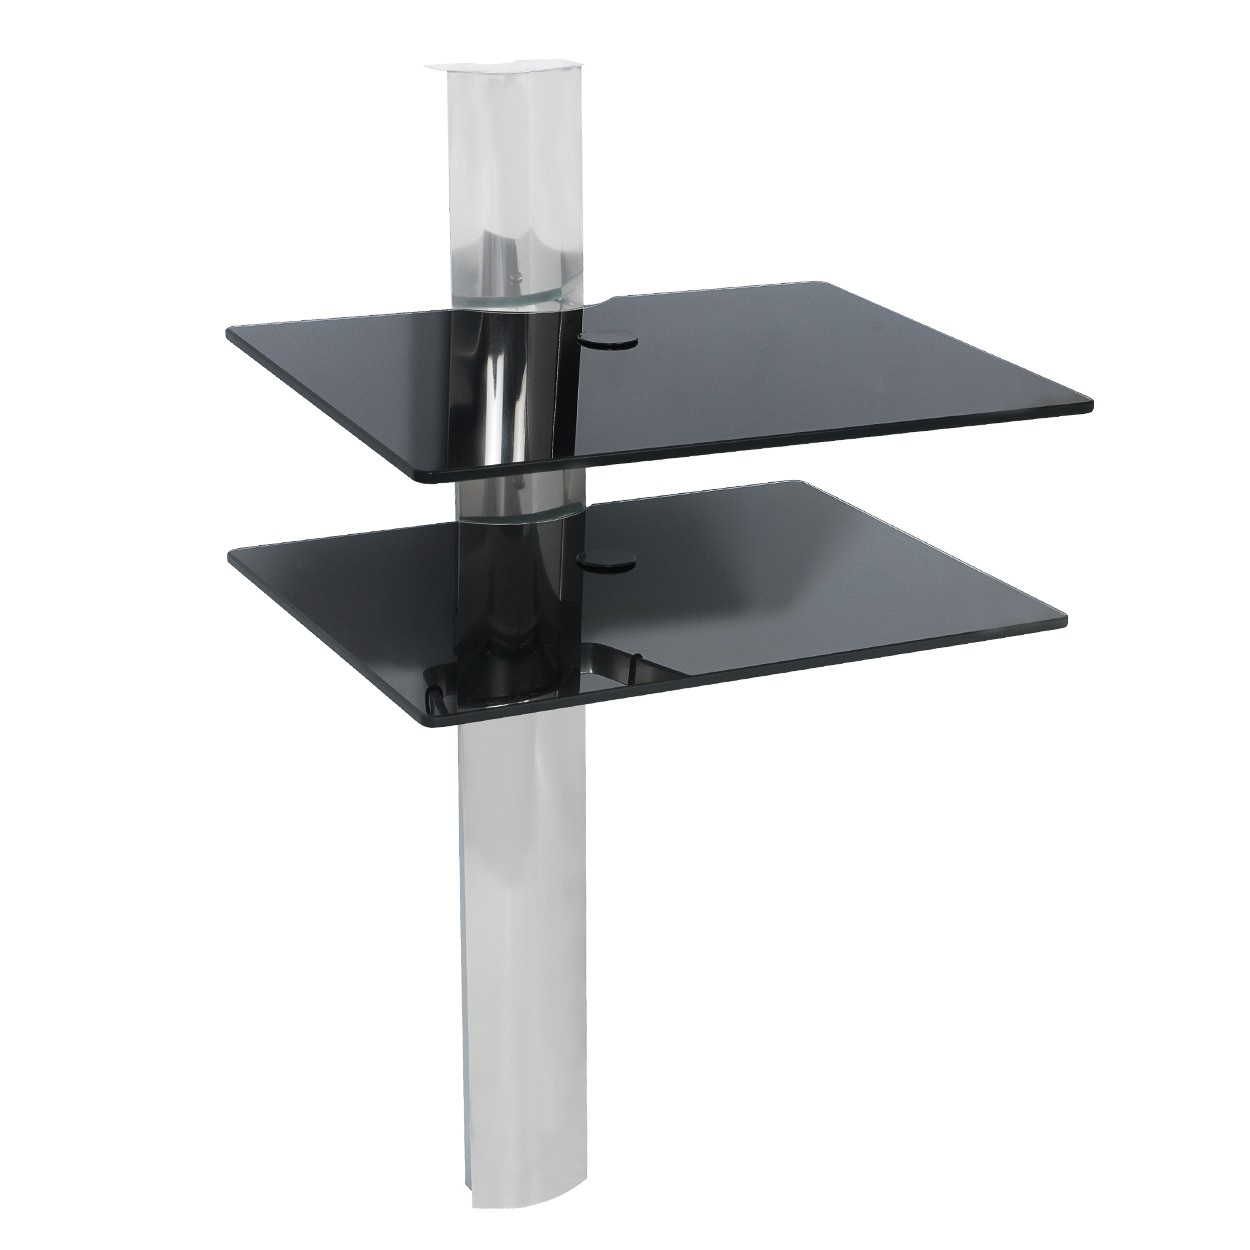 RACK SIMPLY 45/2 TI BLACK GLASS BLACK